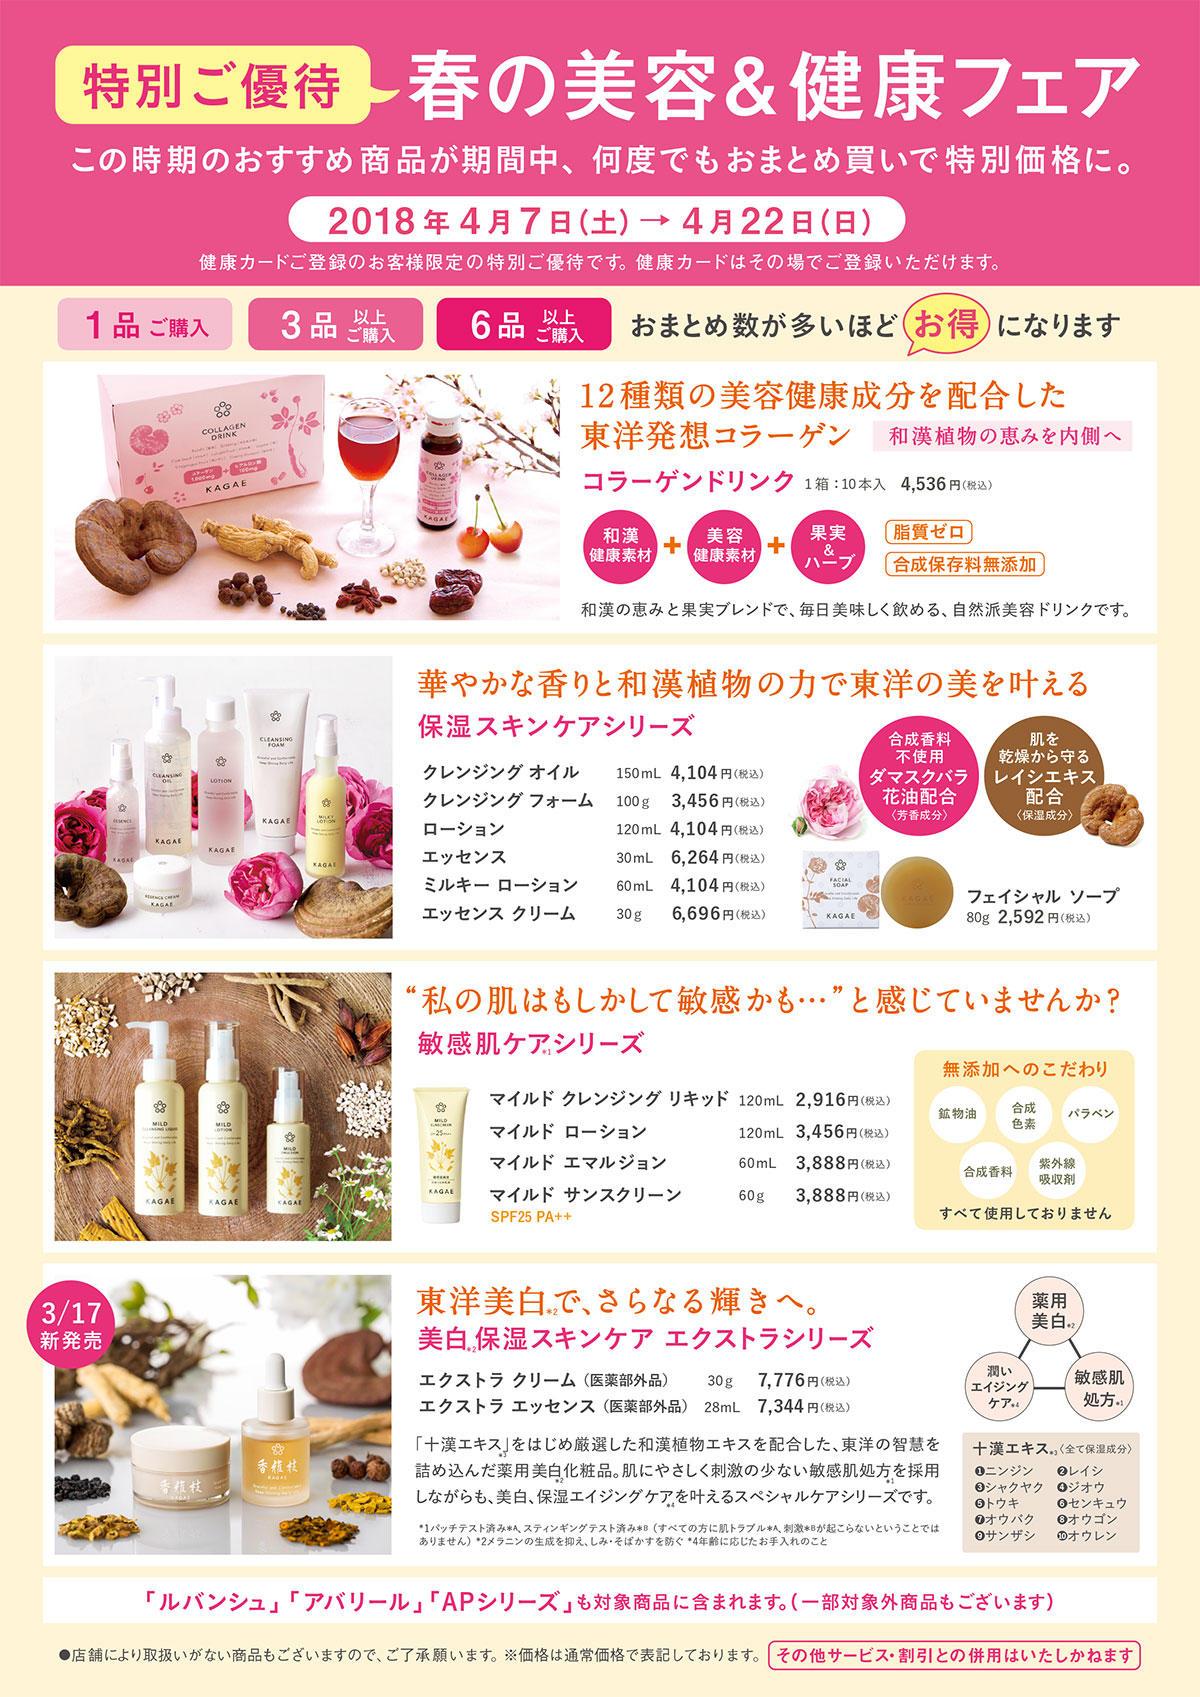 https://www.odori-bisse.com/info/nihondoh_180404_img01.jpg